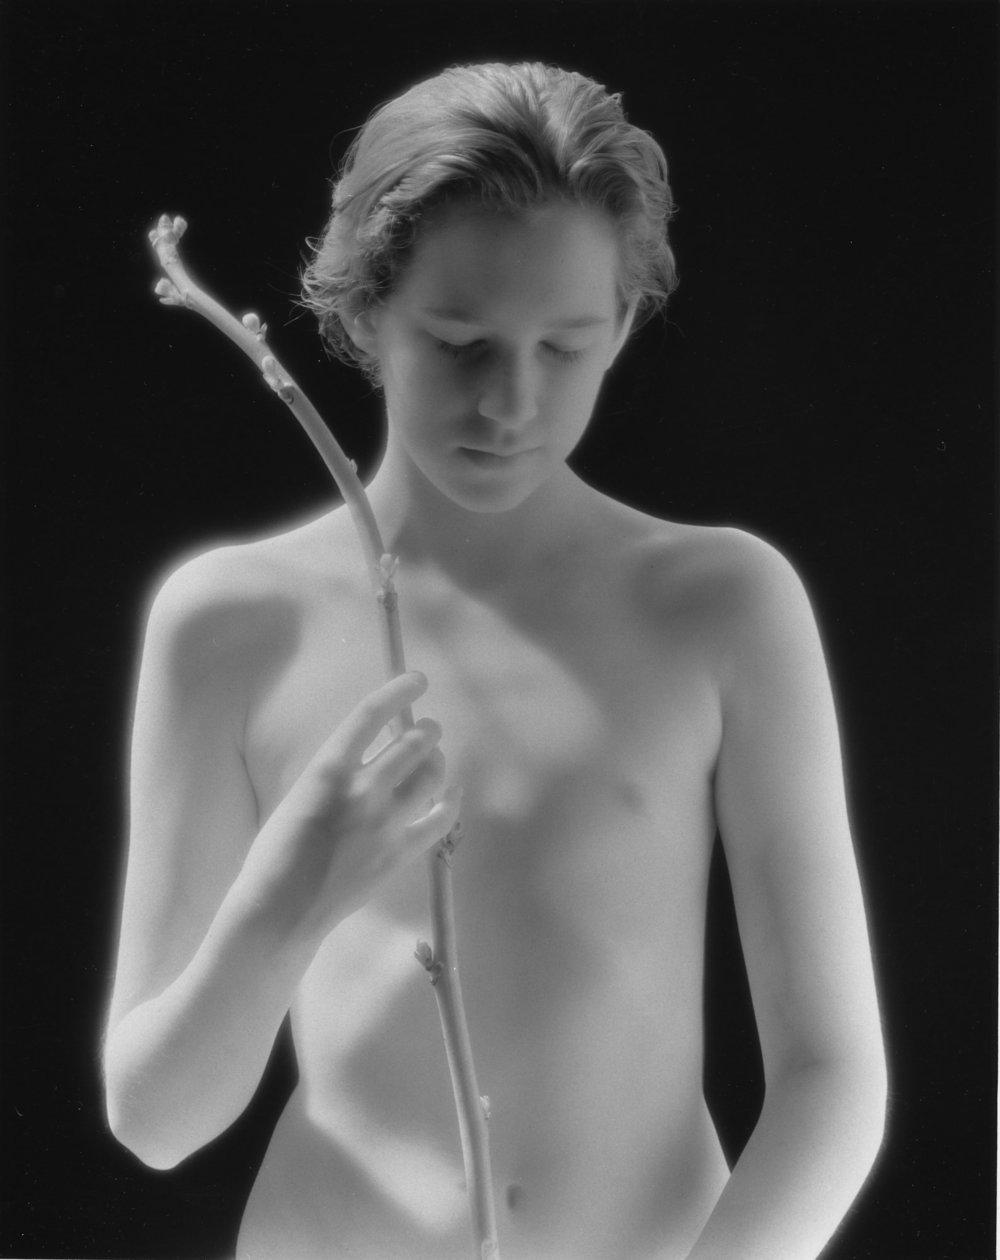 widmertheodoridis_Simone Kappeler_Eschenstecken, 27.4.1992, 50x40cm.jpg